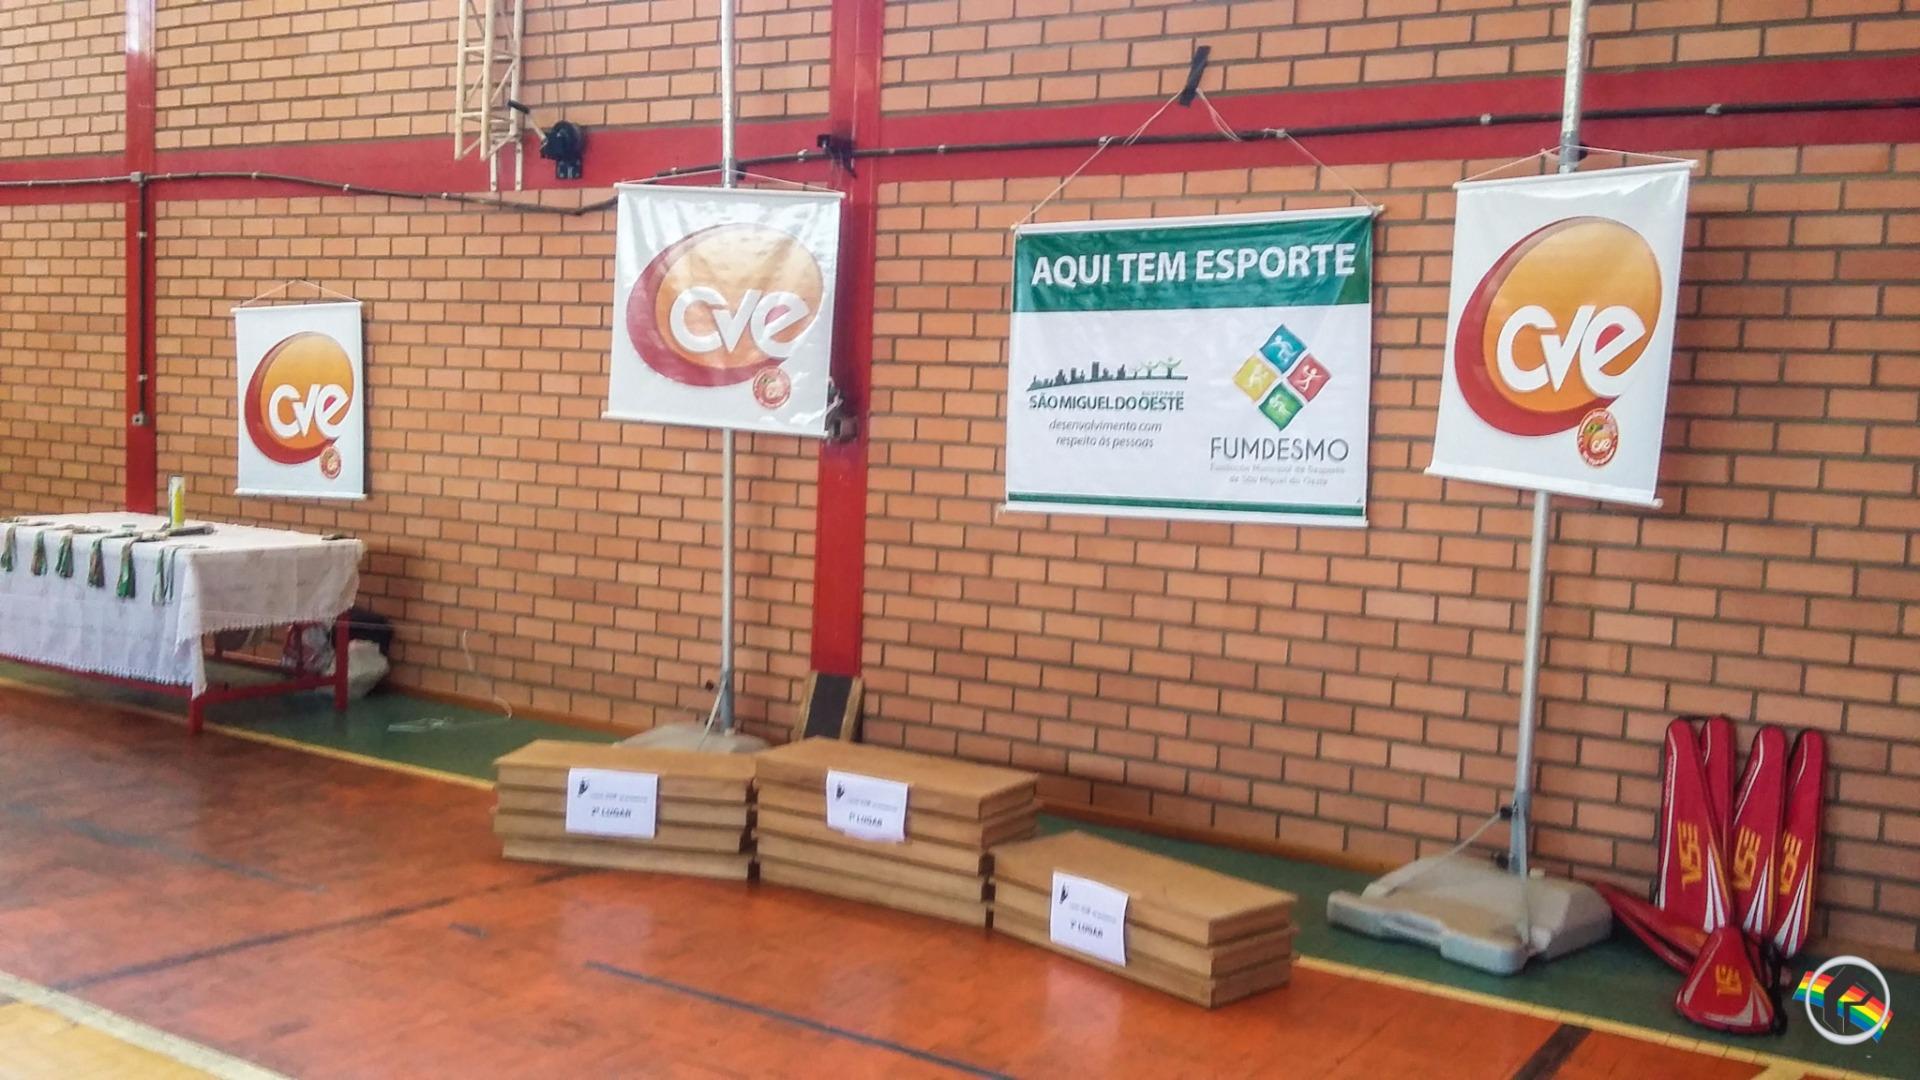 Colégio CVE divulga os vencedores do I CVE Open de Badminton